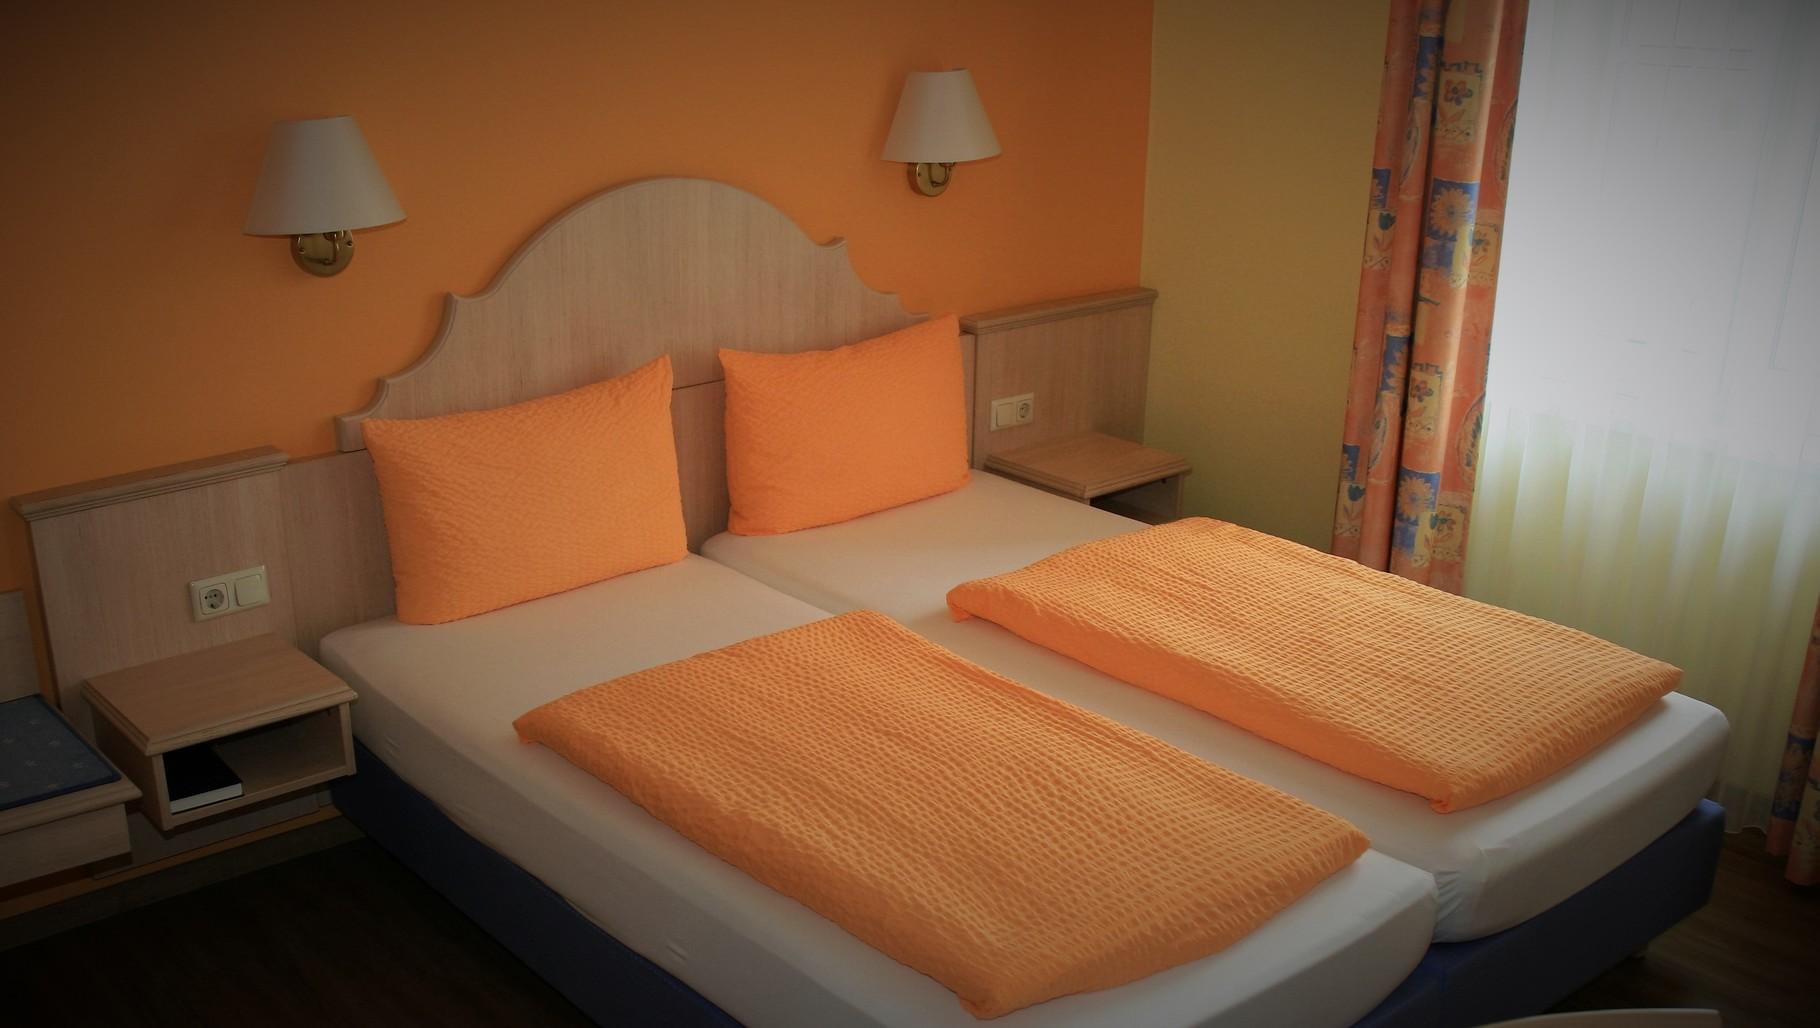 Hotel Hotelgasthof Krones Webseite